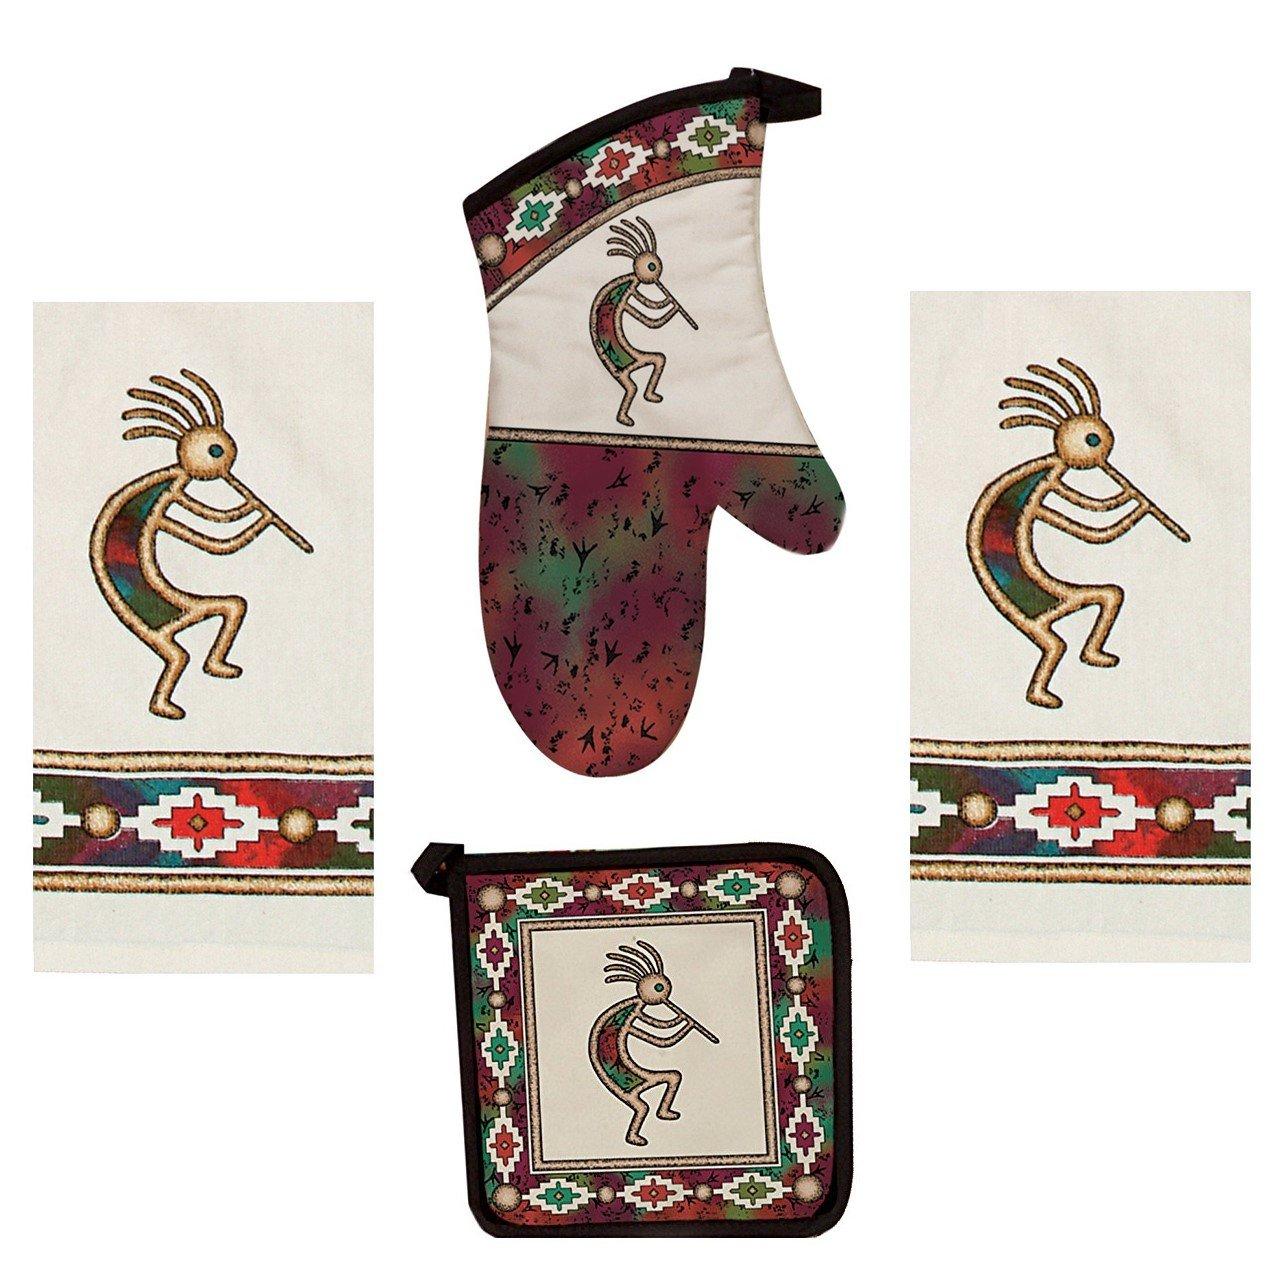 Kay Dee 4 Piece Kokopelli Kitchen Set - 2 Terry Towels, Oven Mitt, Potholder (Canyon Dance Southwest)